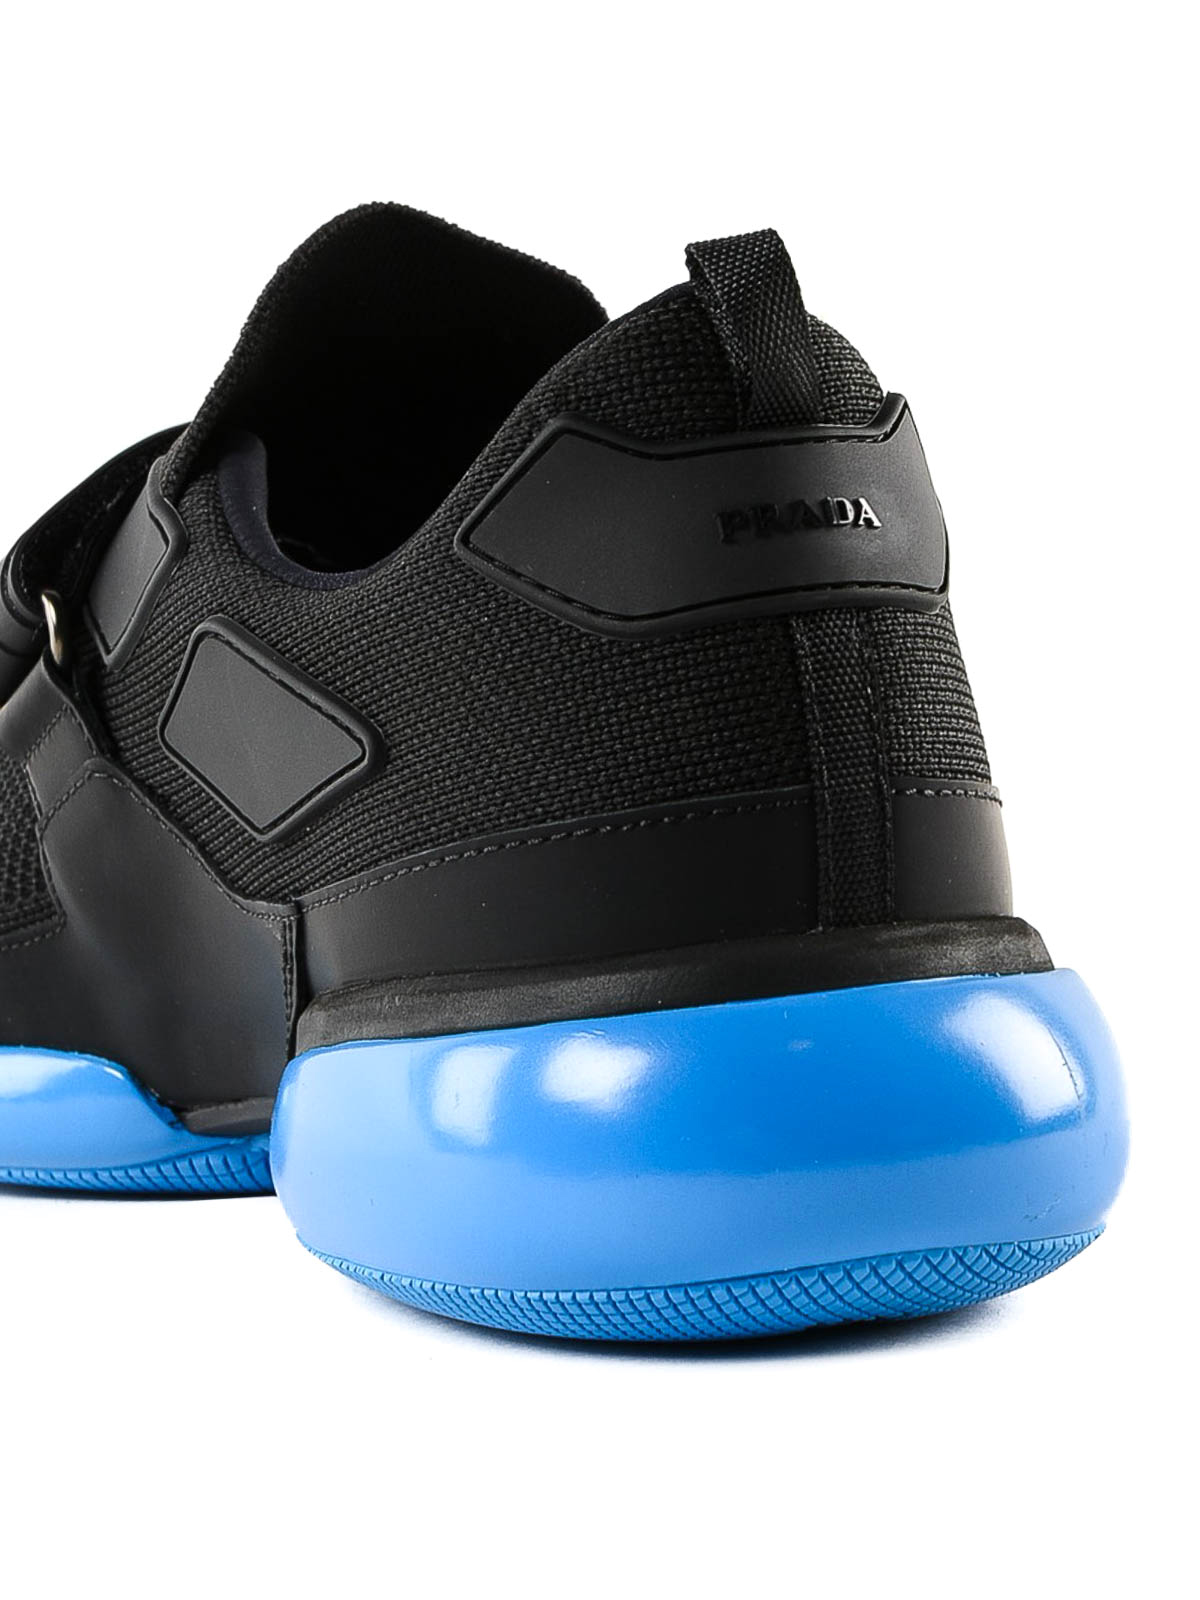 Prada - Cloudbust black and blue fabric